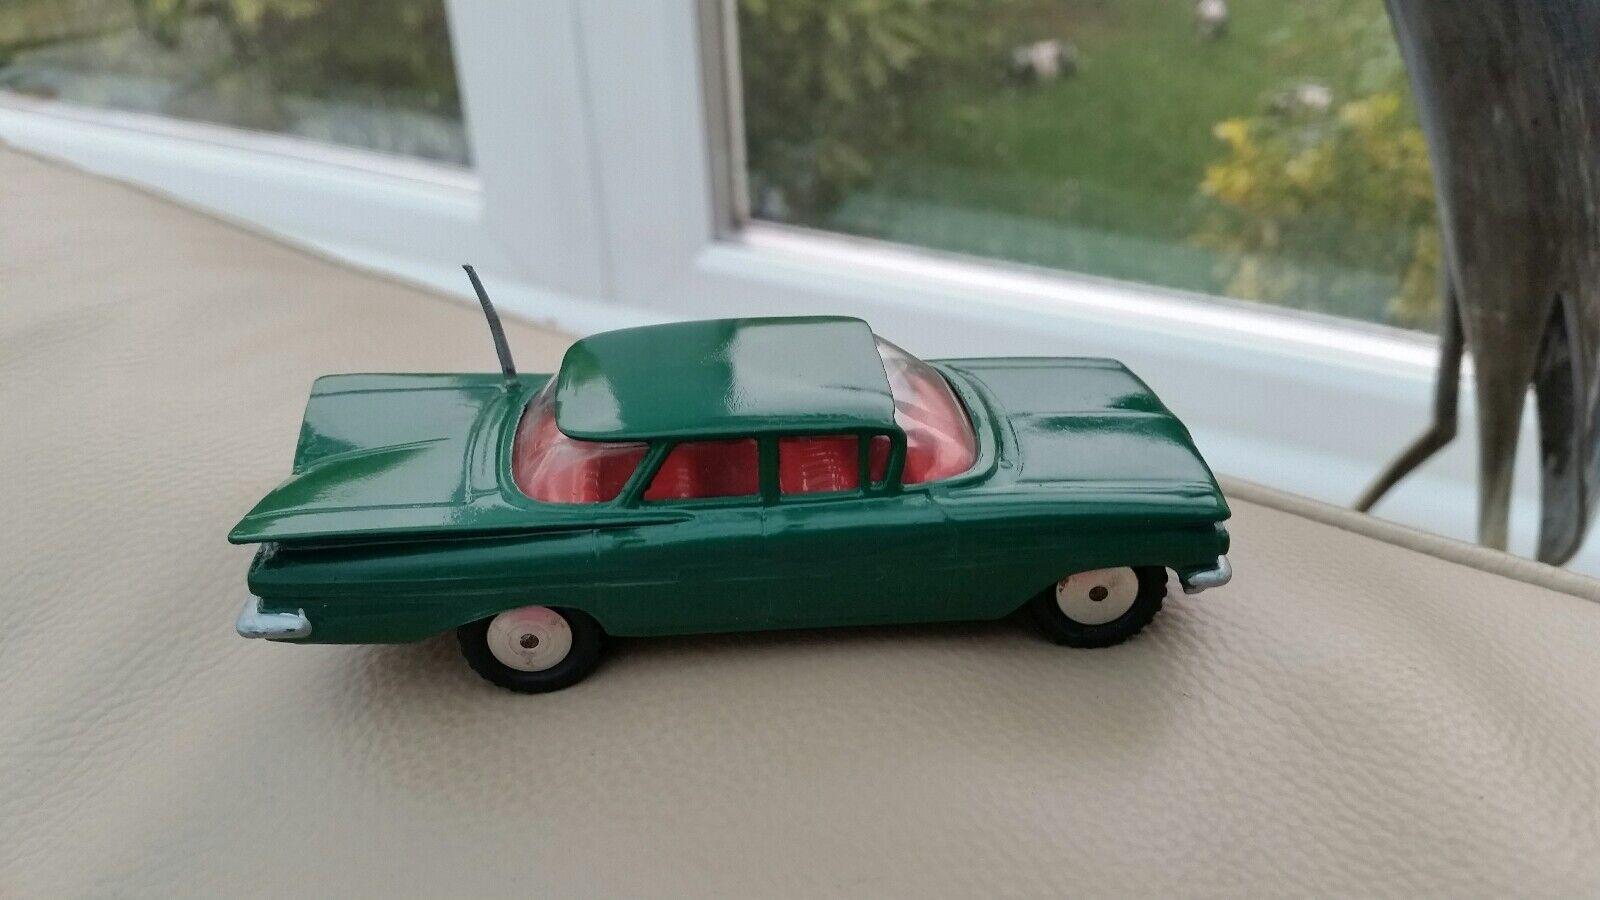 Vintage Diecast Corgi Dark Green Code 3 Chevrolet Impala Spun Wheels Refurbished